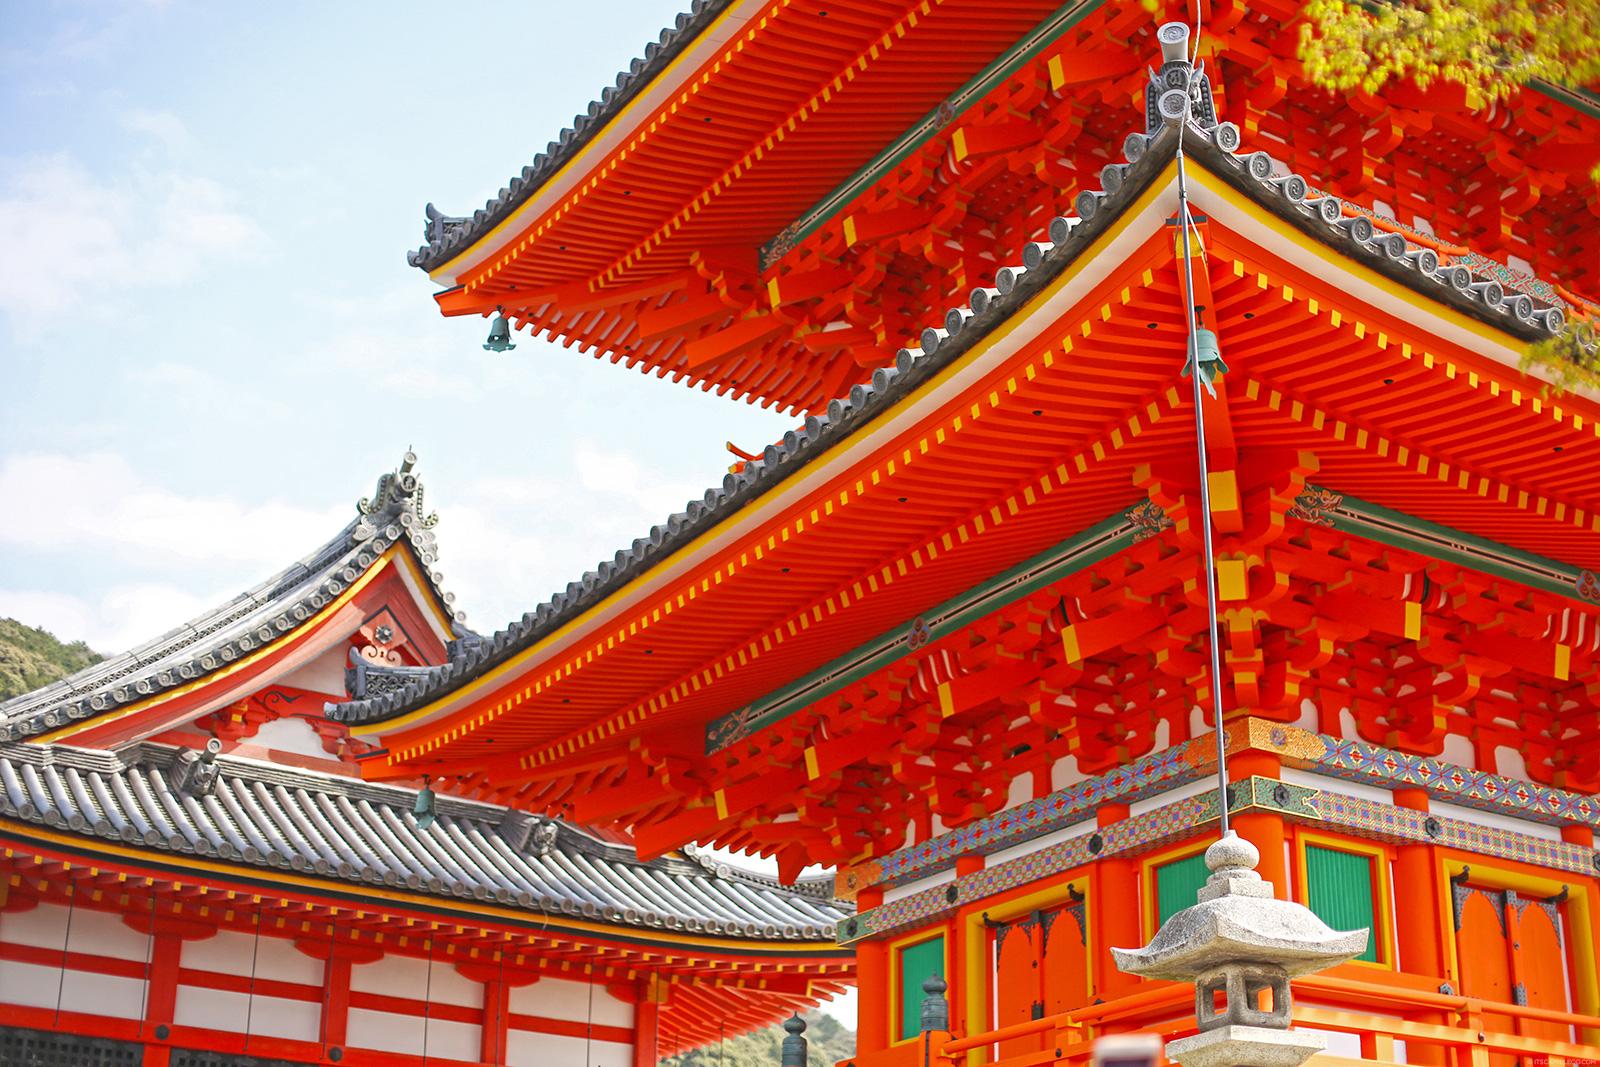 Kiyomizu-dera Temple, Kyoto | www.itscamilleco.com